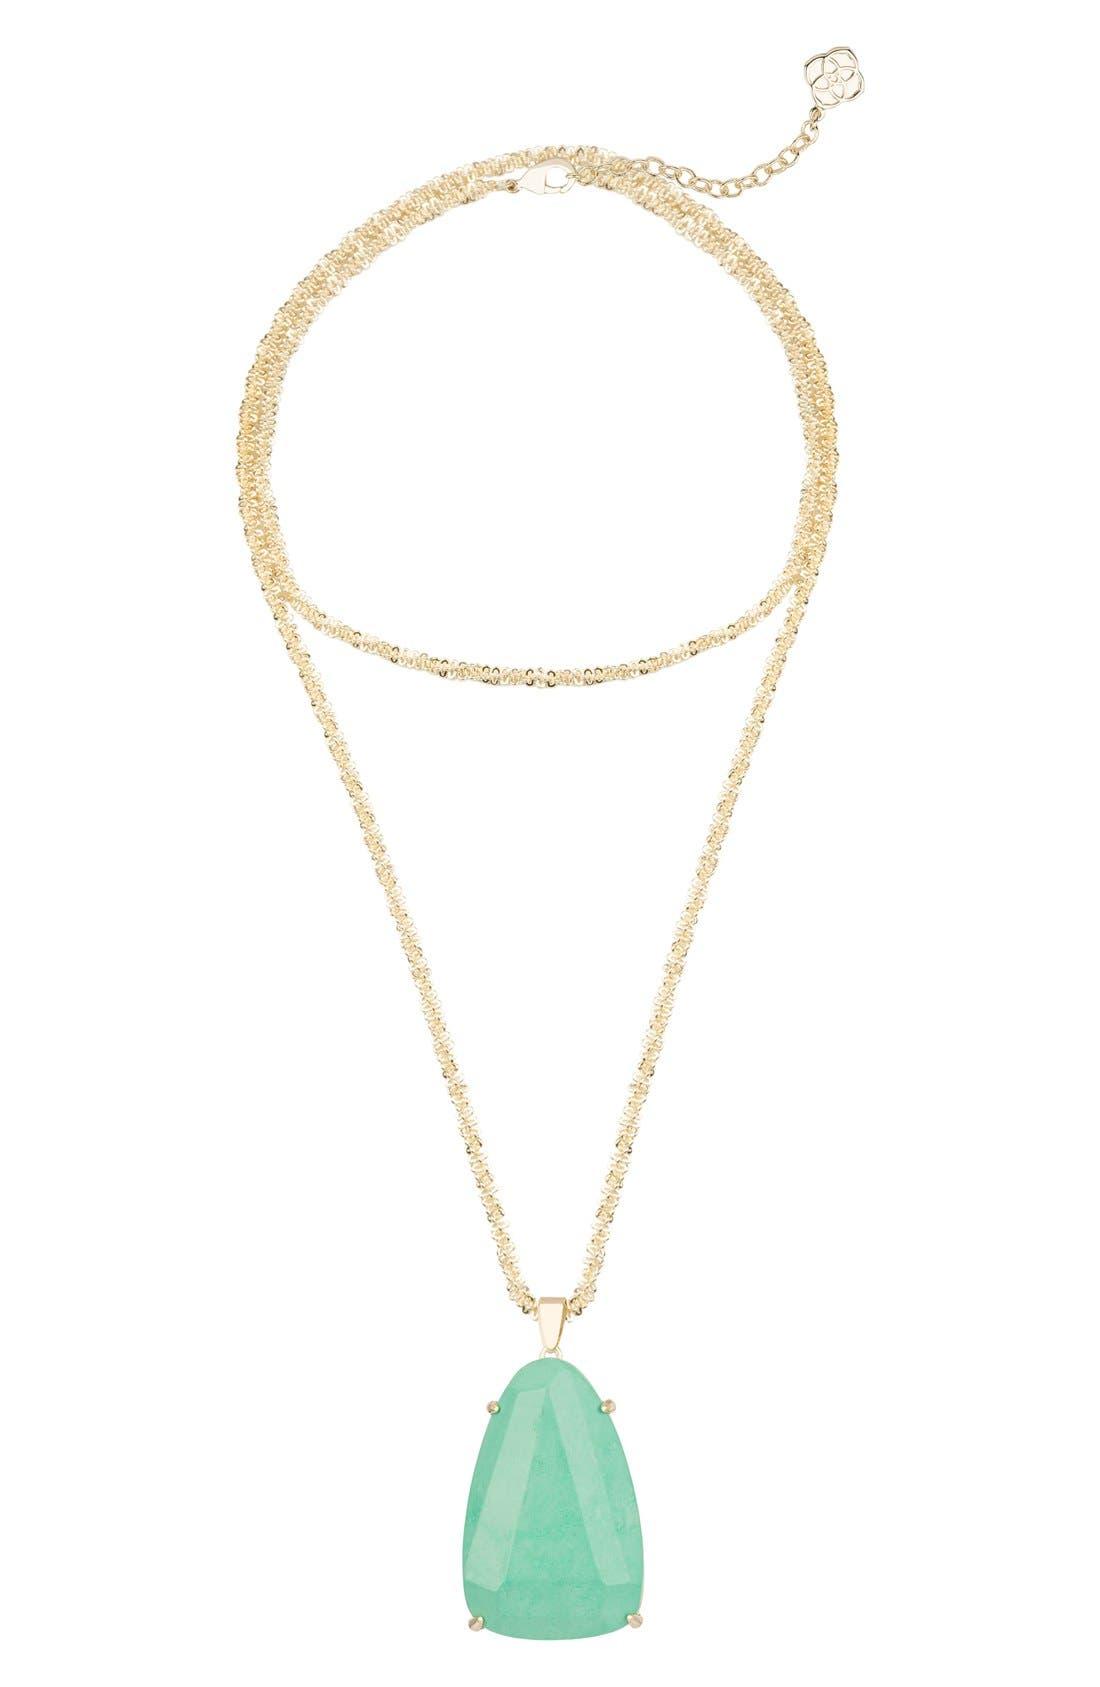 Main Image - Kendra Scott 'Sandra' Long Pendant Necklace